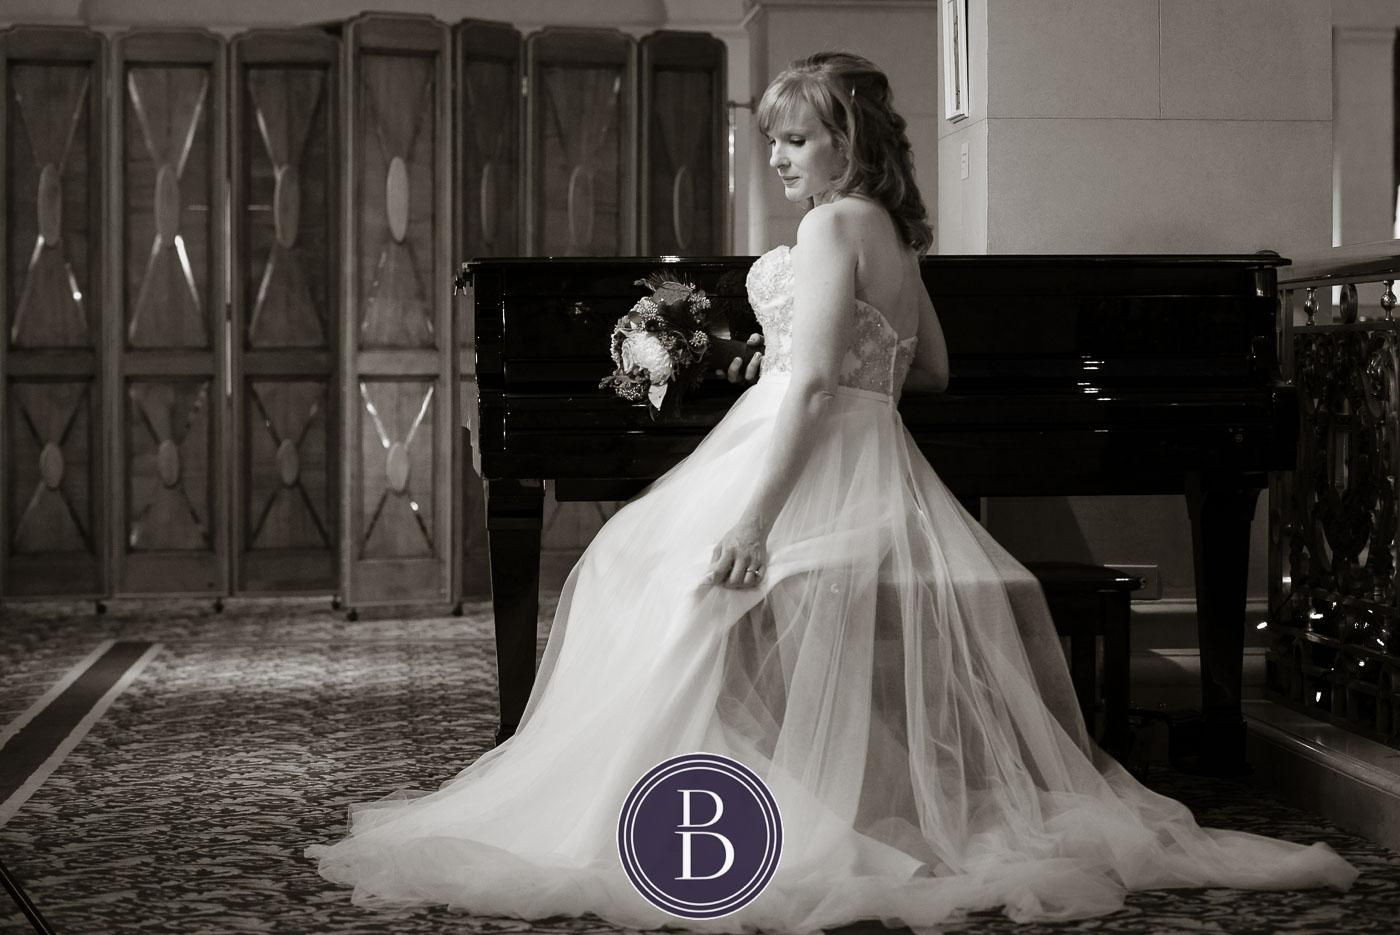 Bridal portrait at the piano